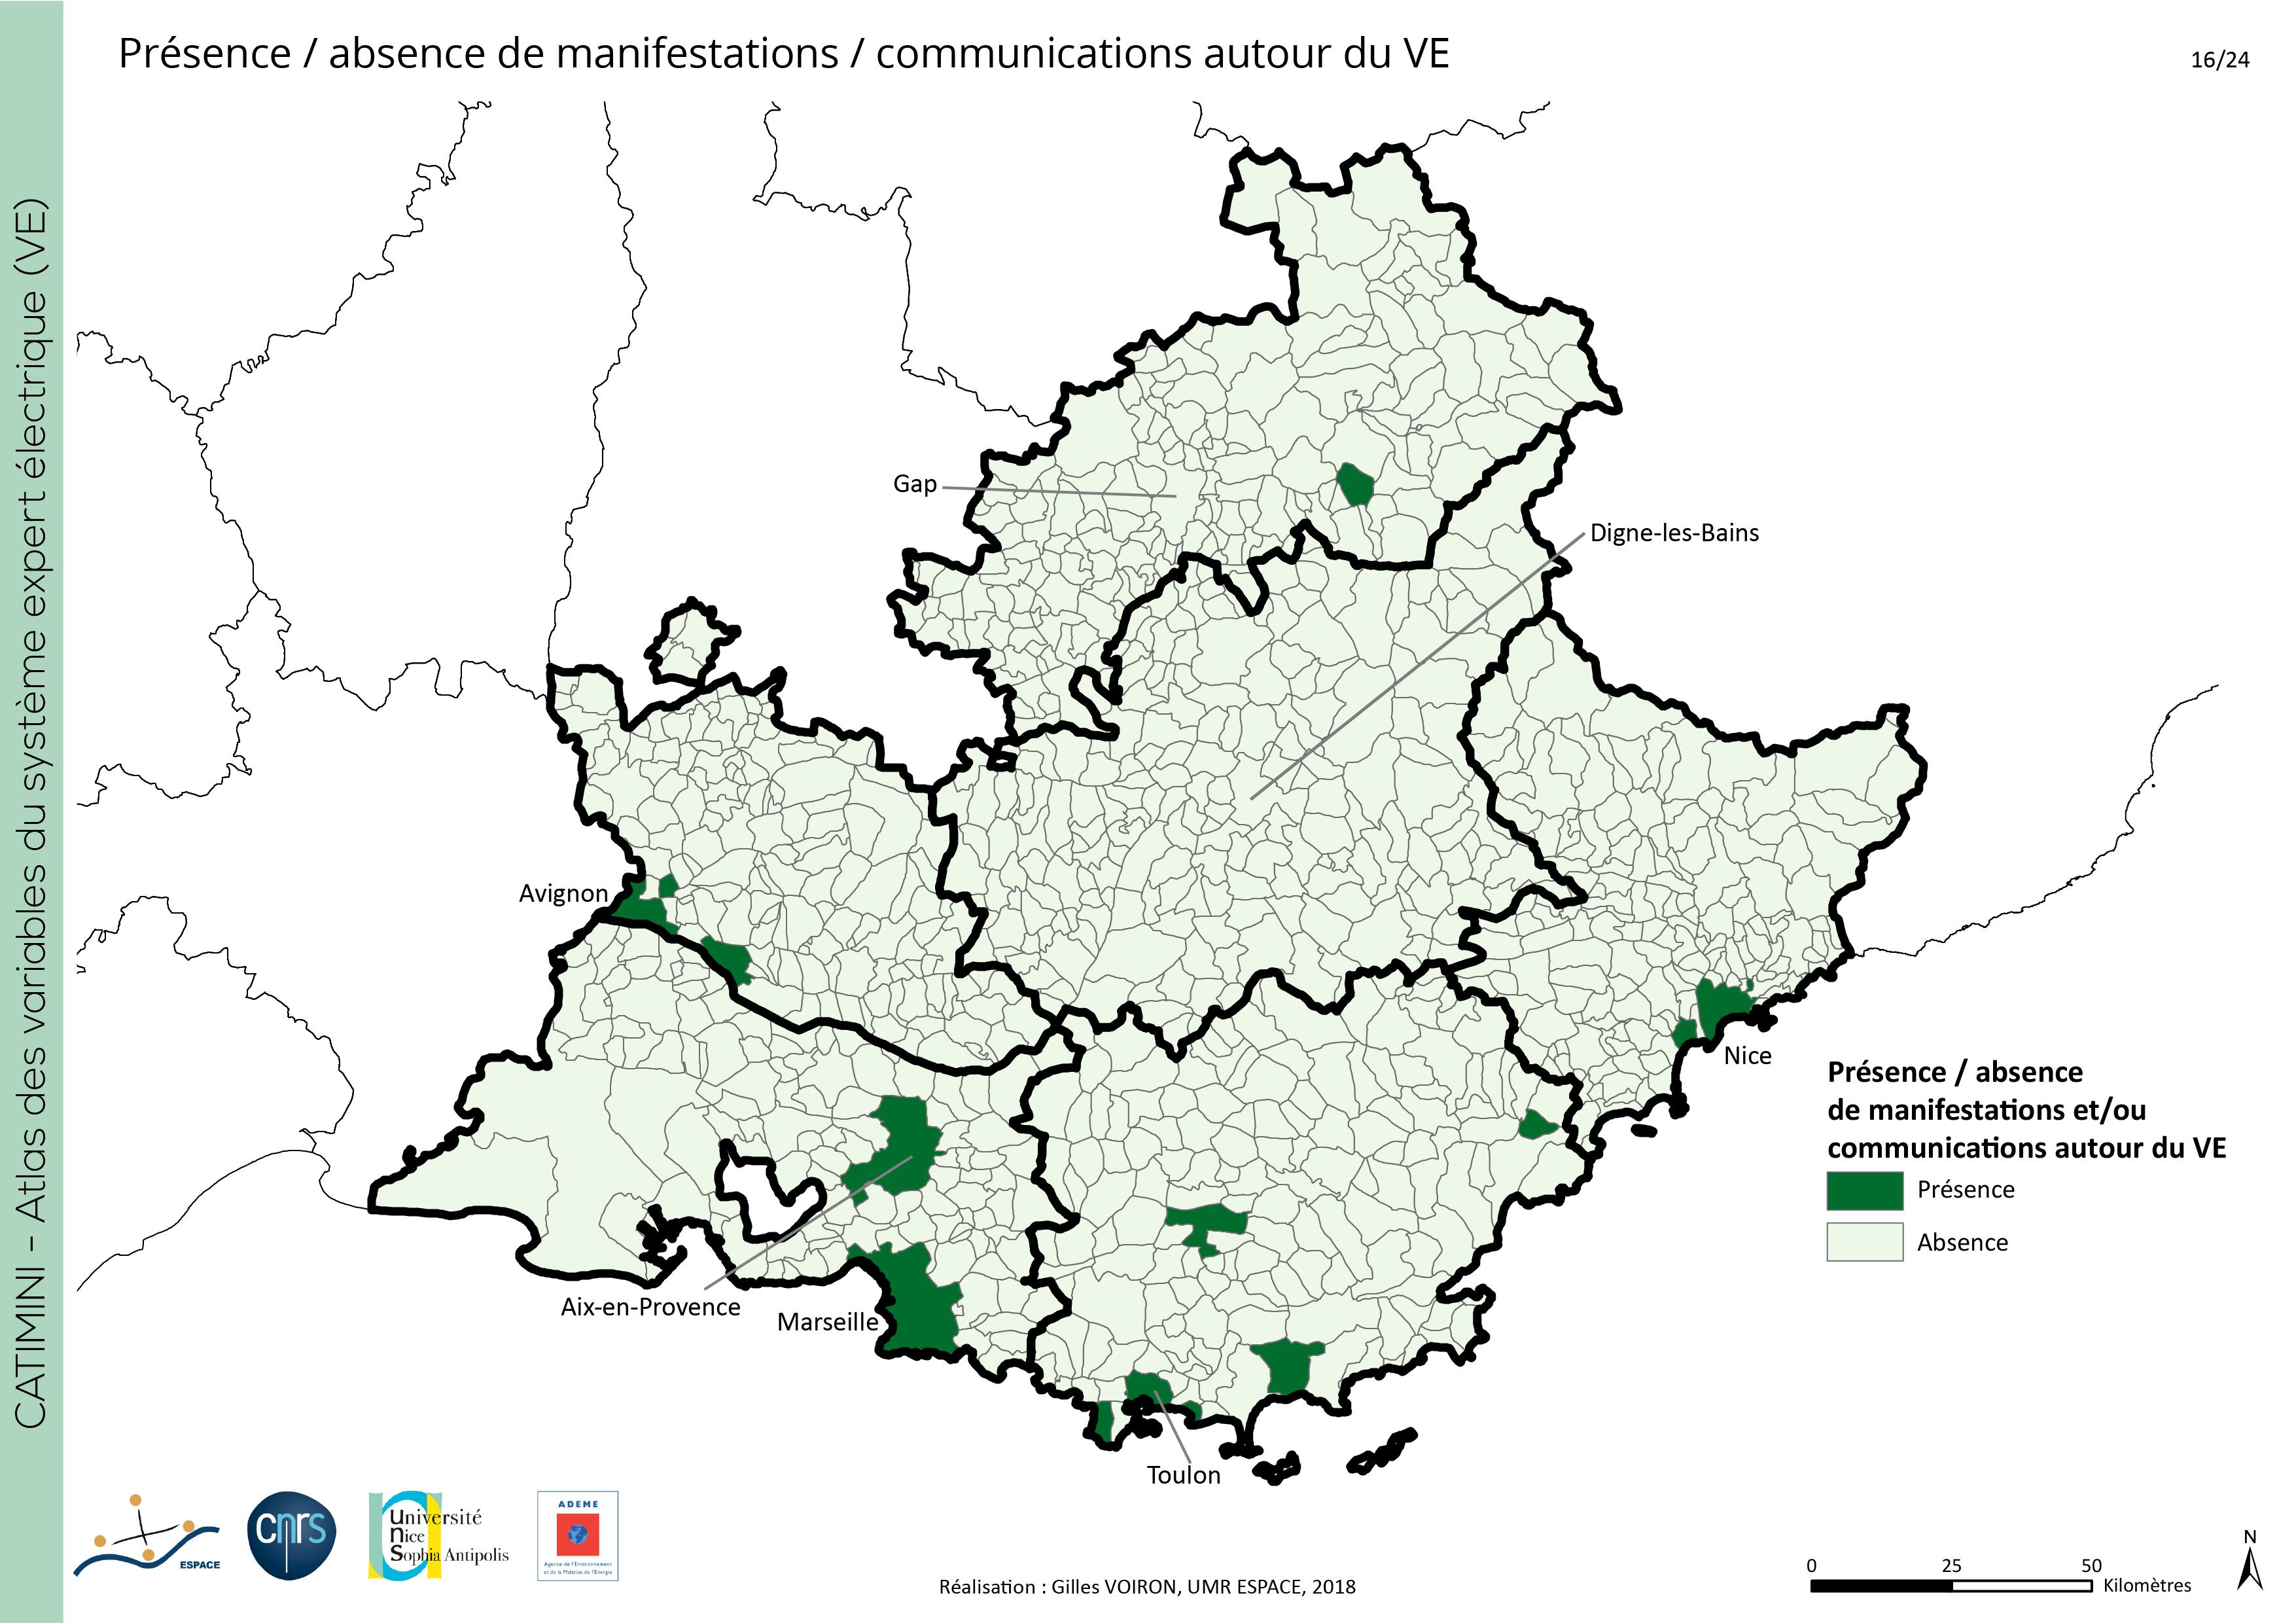 16 Manifestations communications